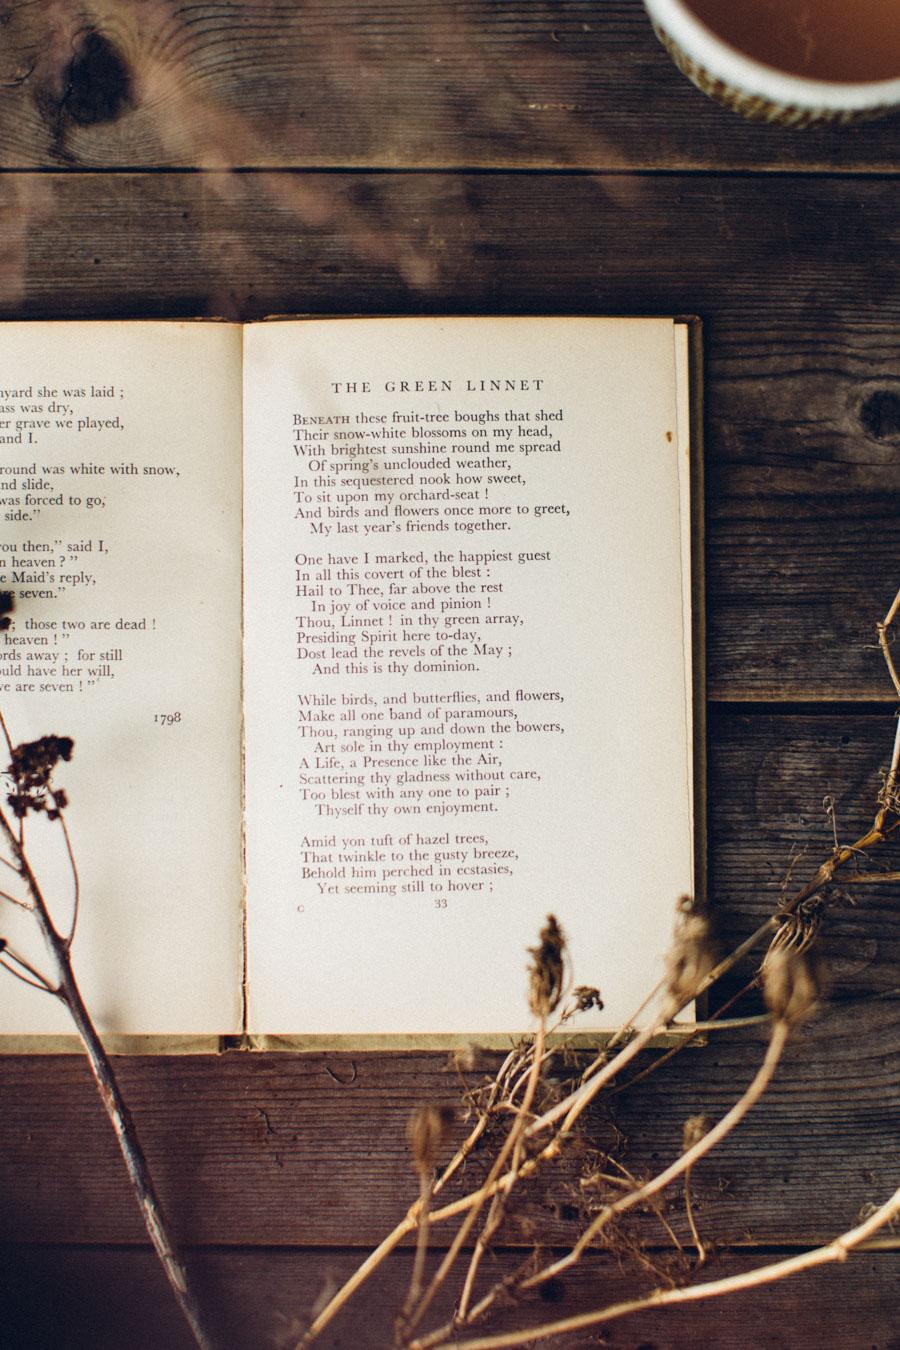 The Green Linnet - Wordsworth